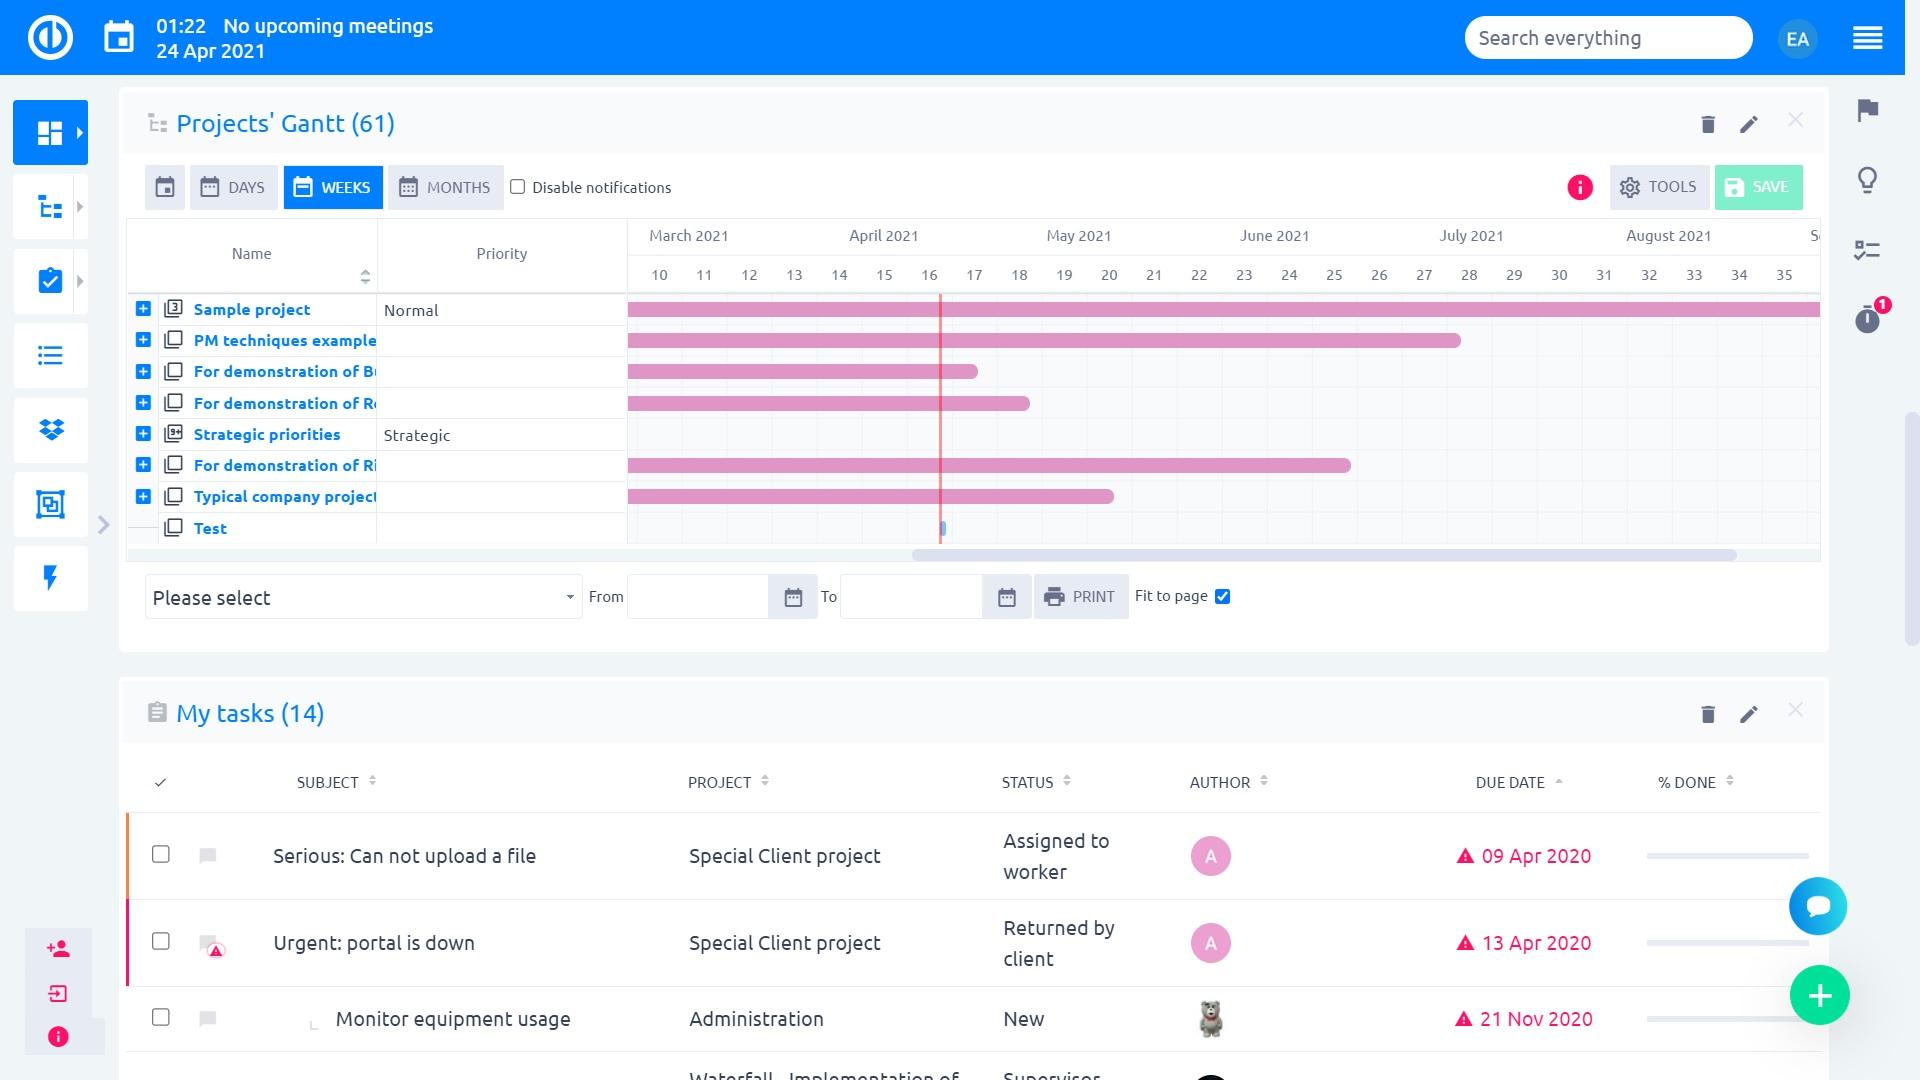 Easy Redmine 2019 - Modal view of tasks